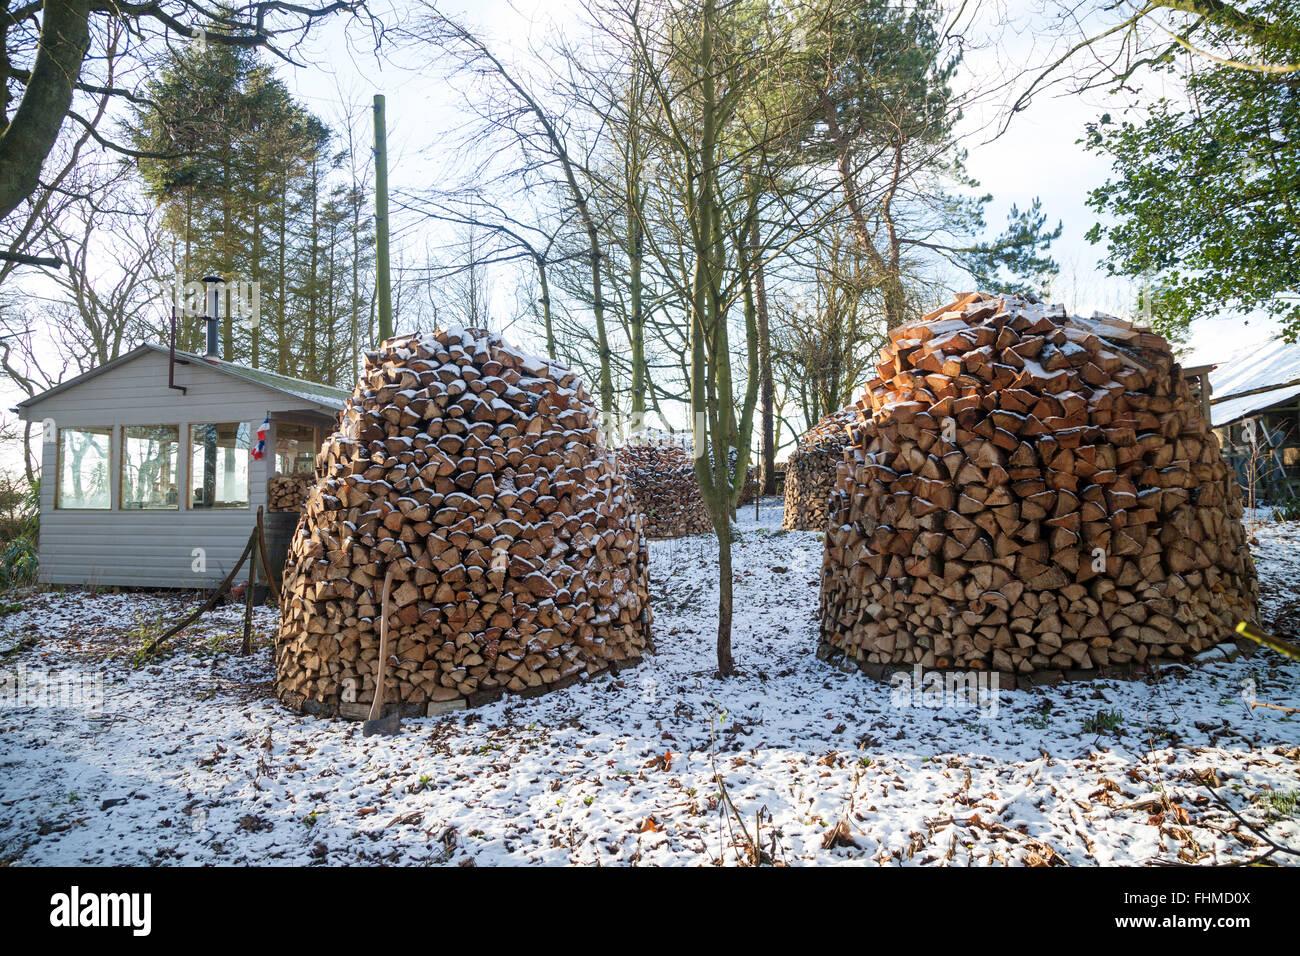 Holz Hausen Wood Stacks In A Garden In Fife Scotland Stock Photo